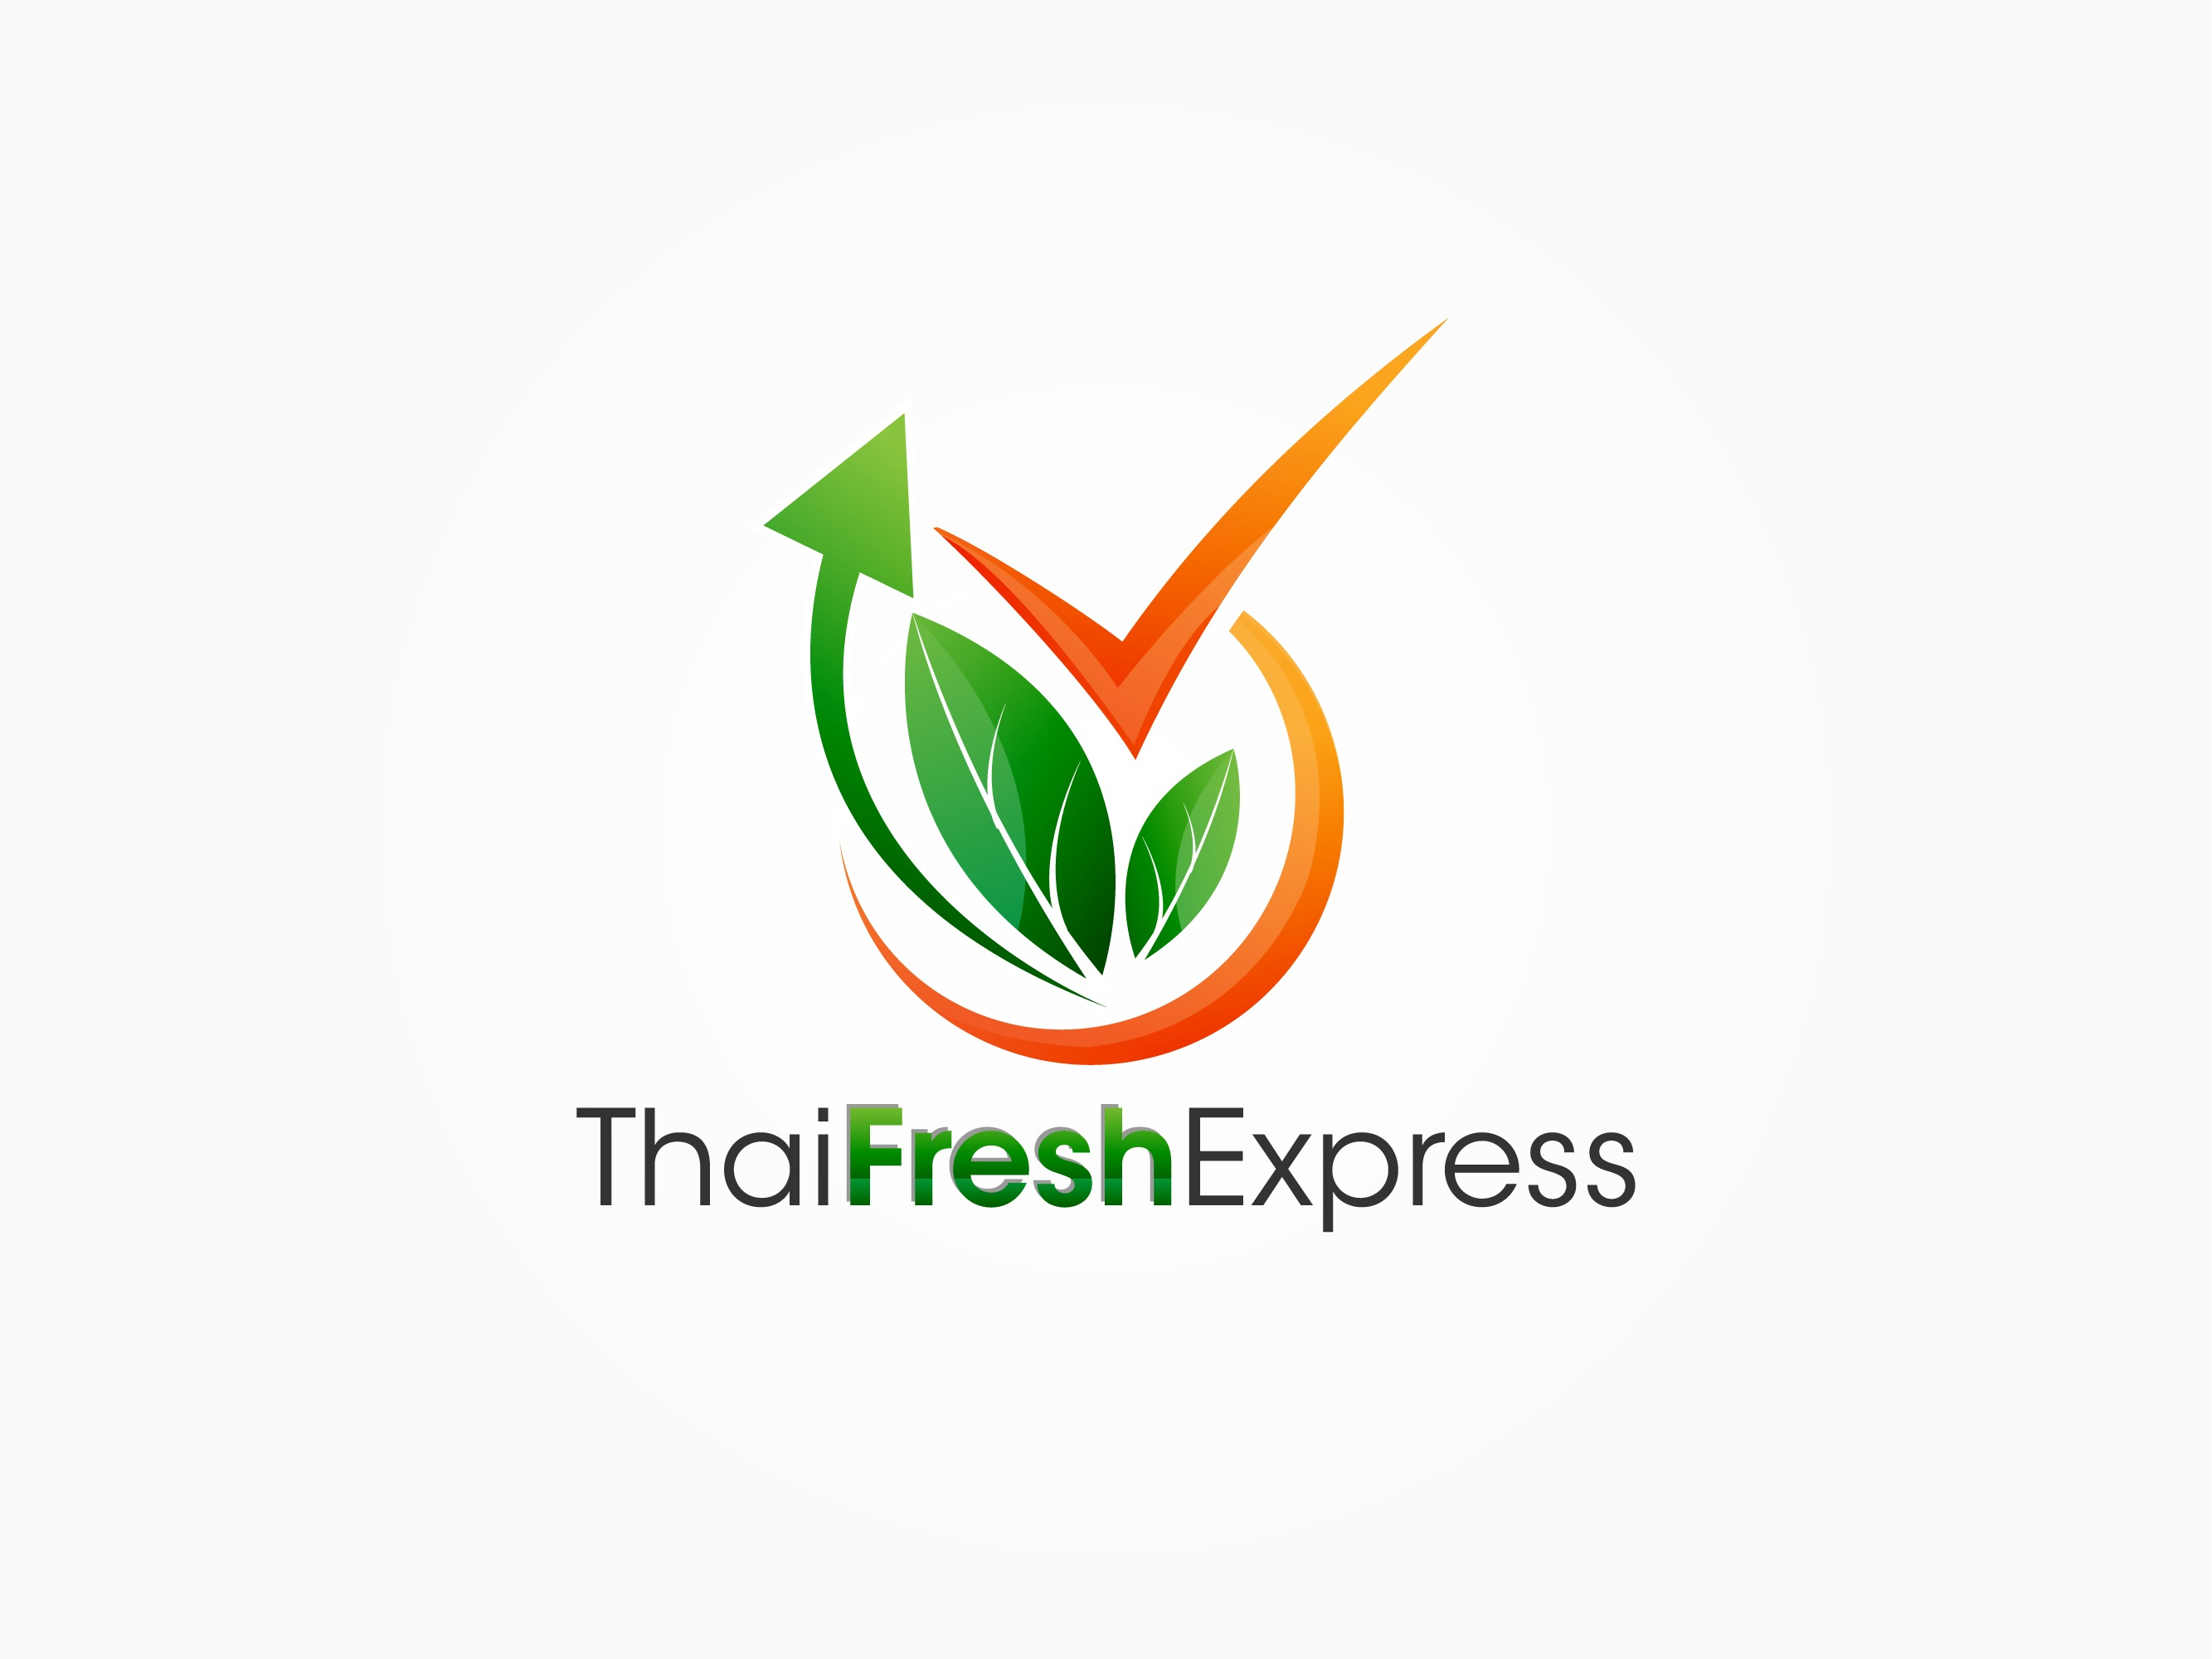 THAIFRESHEXPRESS LOGO